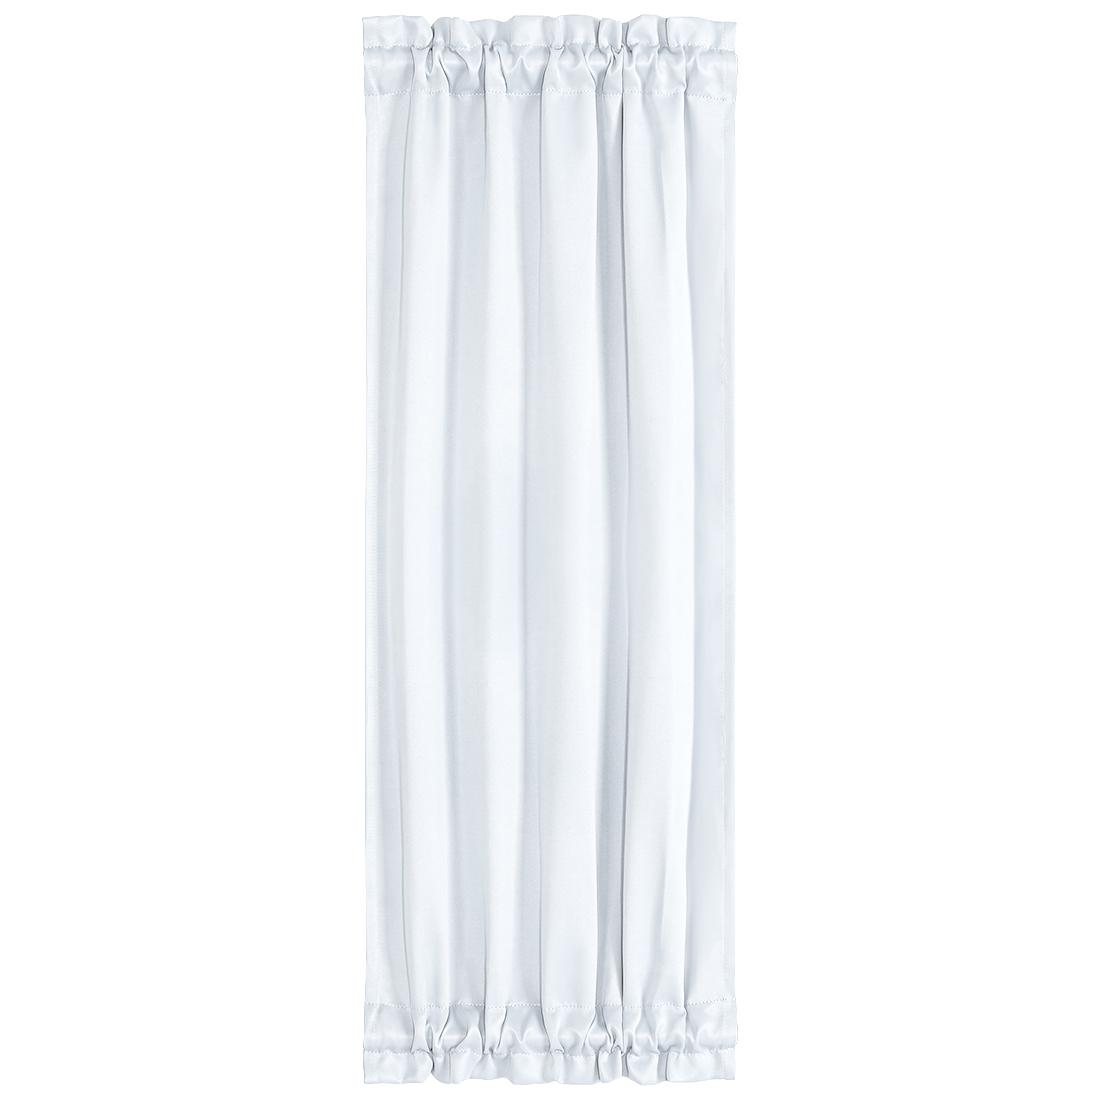 Elegant 25 x 72 Inch Blackout Curtains Rod Sliding Door Drapes Greyish White